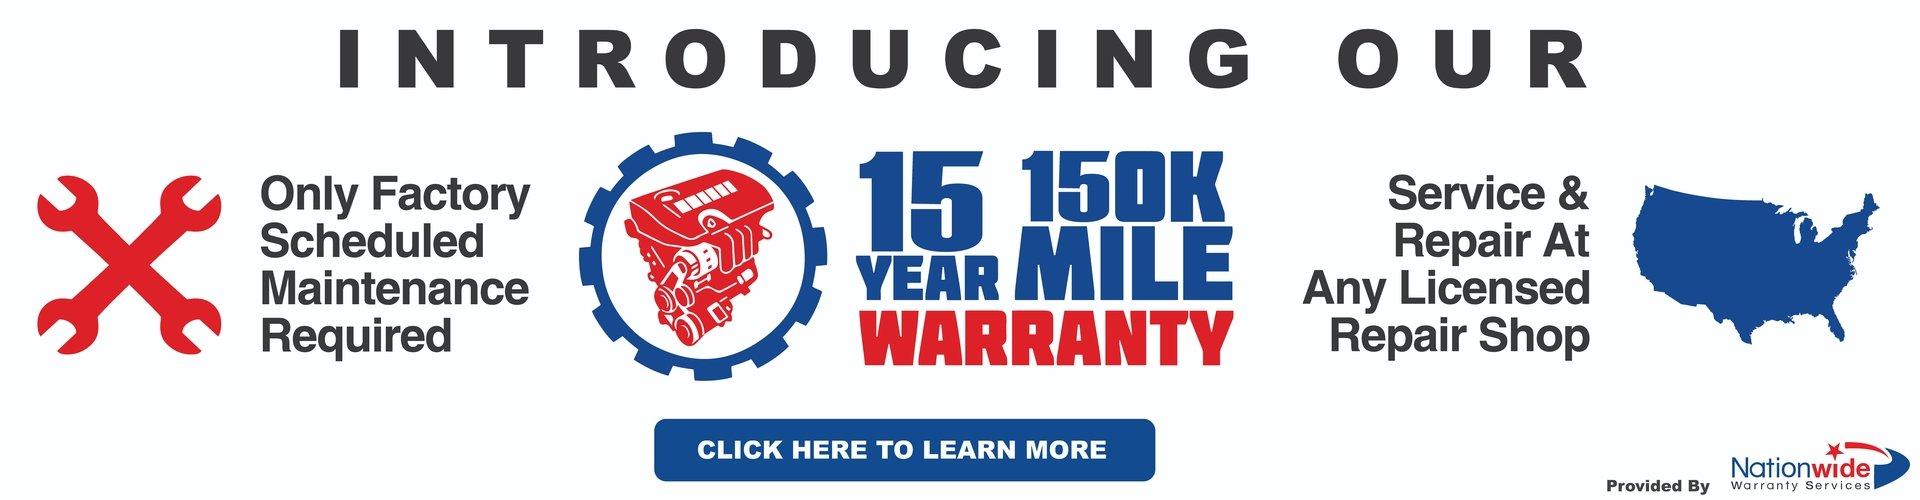 15 Year 150,000 Mile Warranty